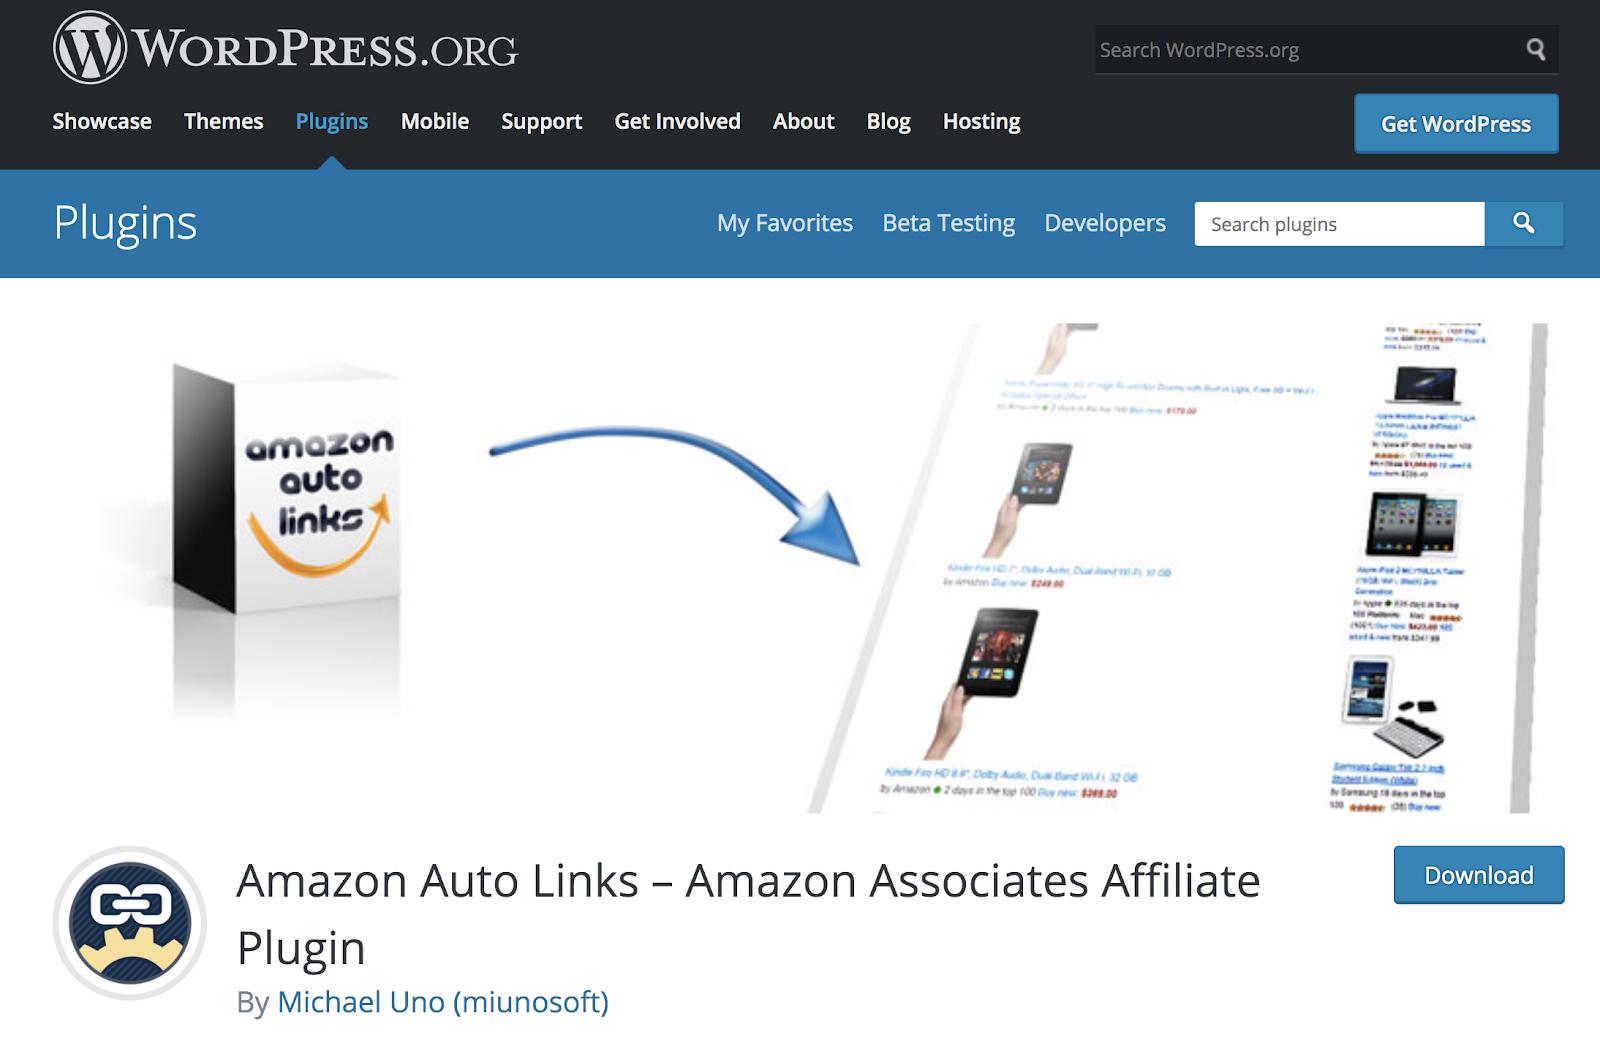 amazon auto links homepage screenshot